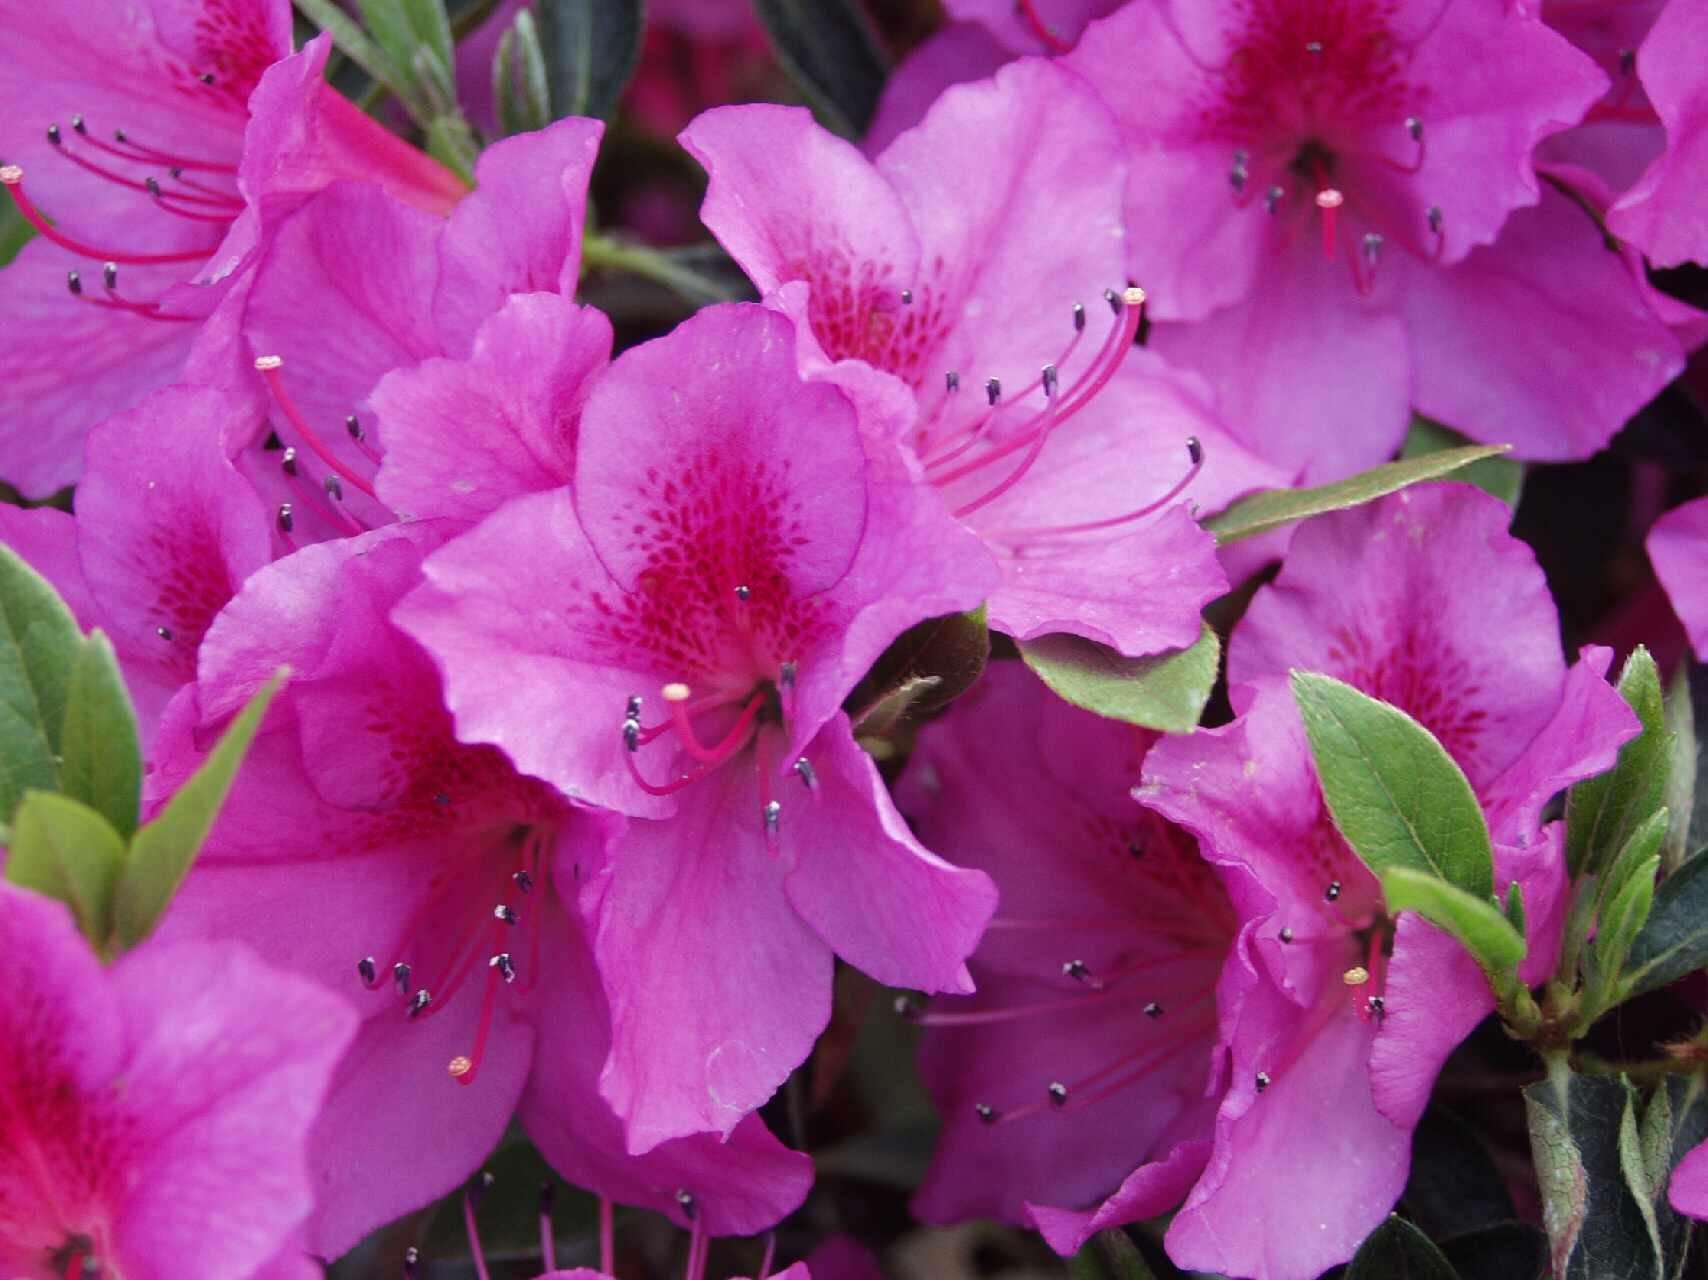 Azalea Rhododendron 'Formosa' Qty 40 Live Flowering Evergreen Plants